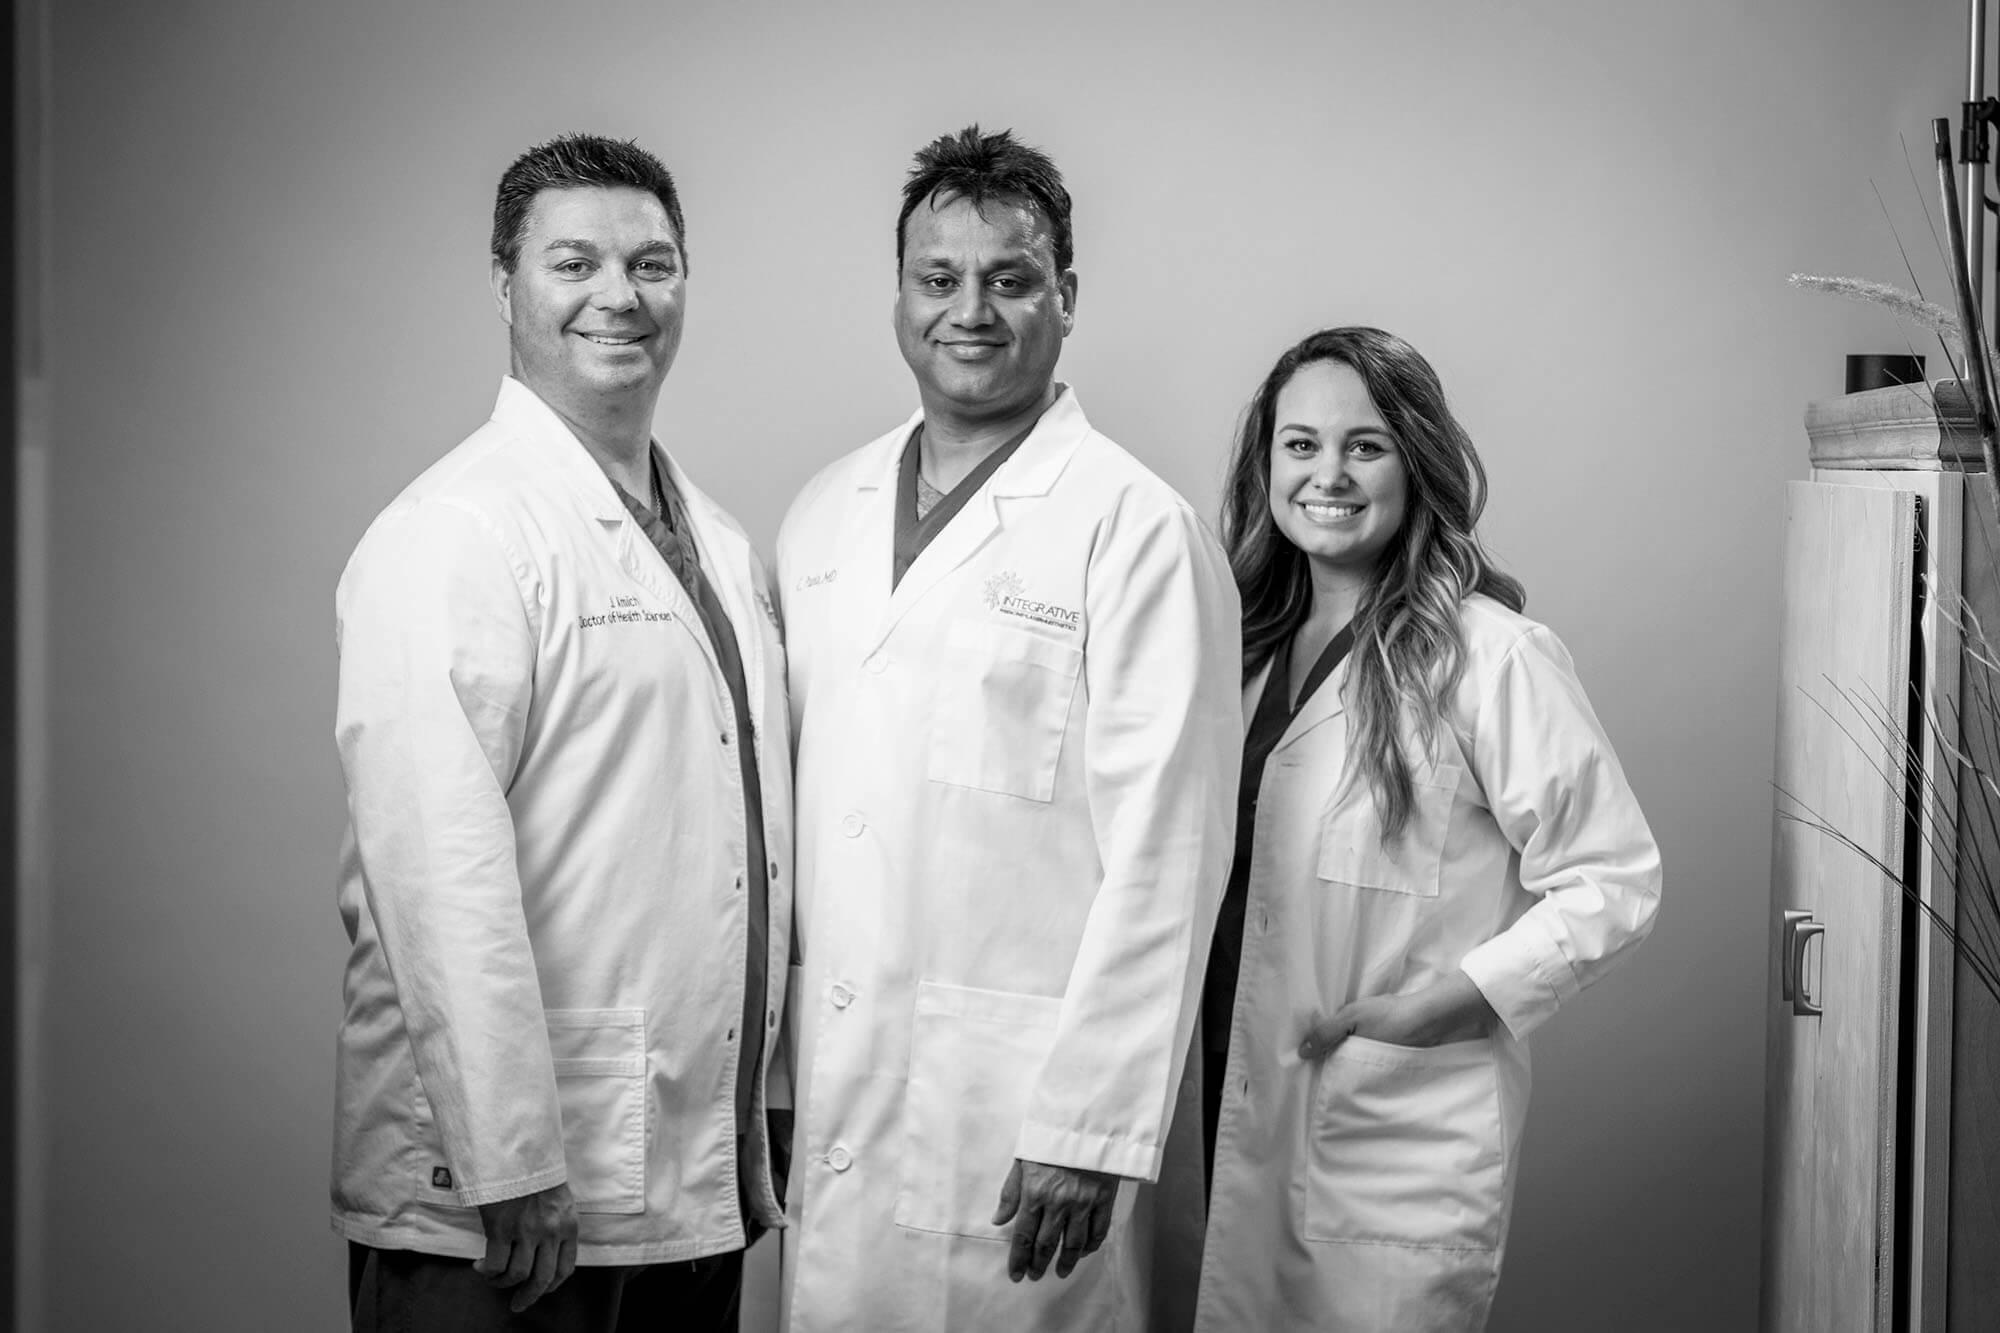 Integrative Medicine, Laser and Aesthetics team